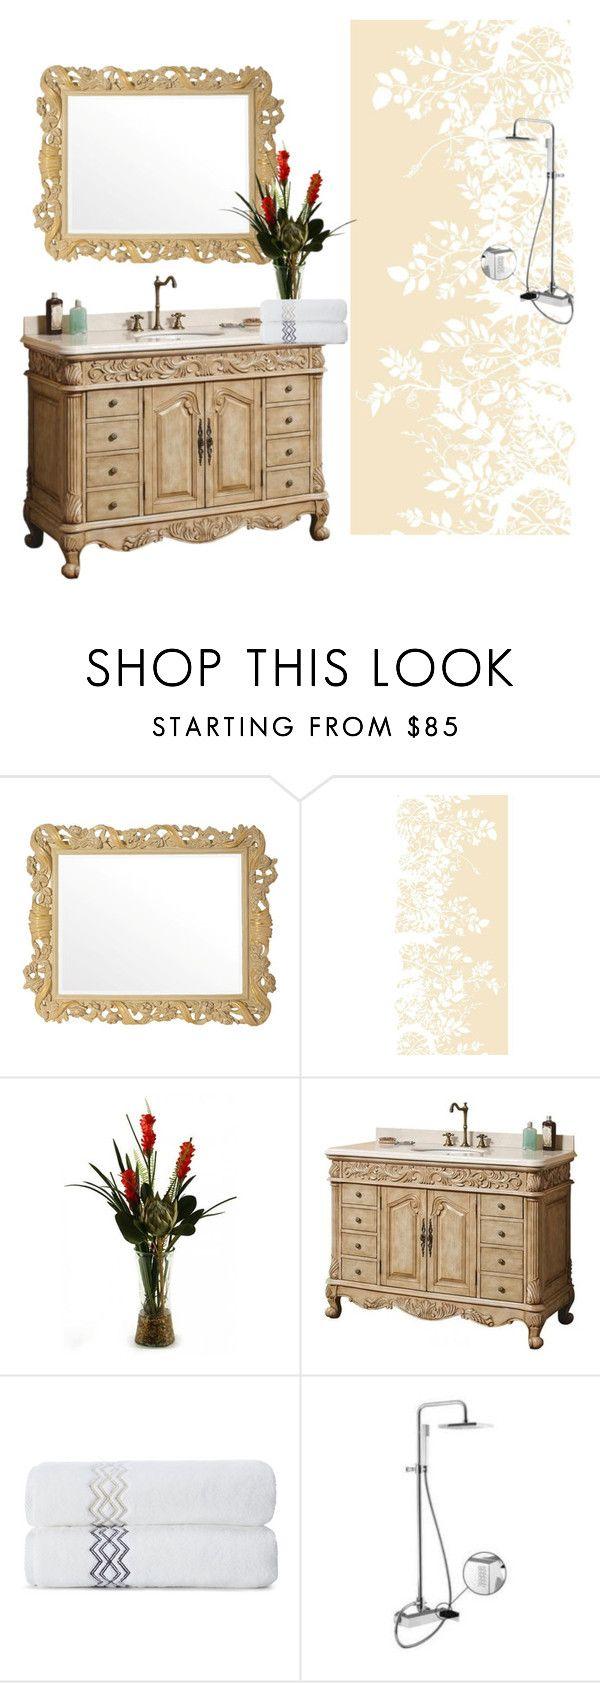 43 best Savio Firmino Style images on Pinterest | Mirrors ...